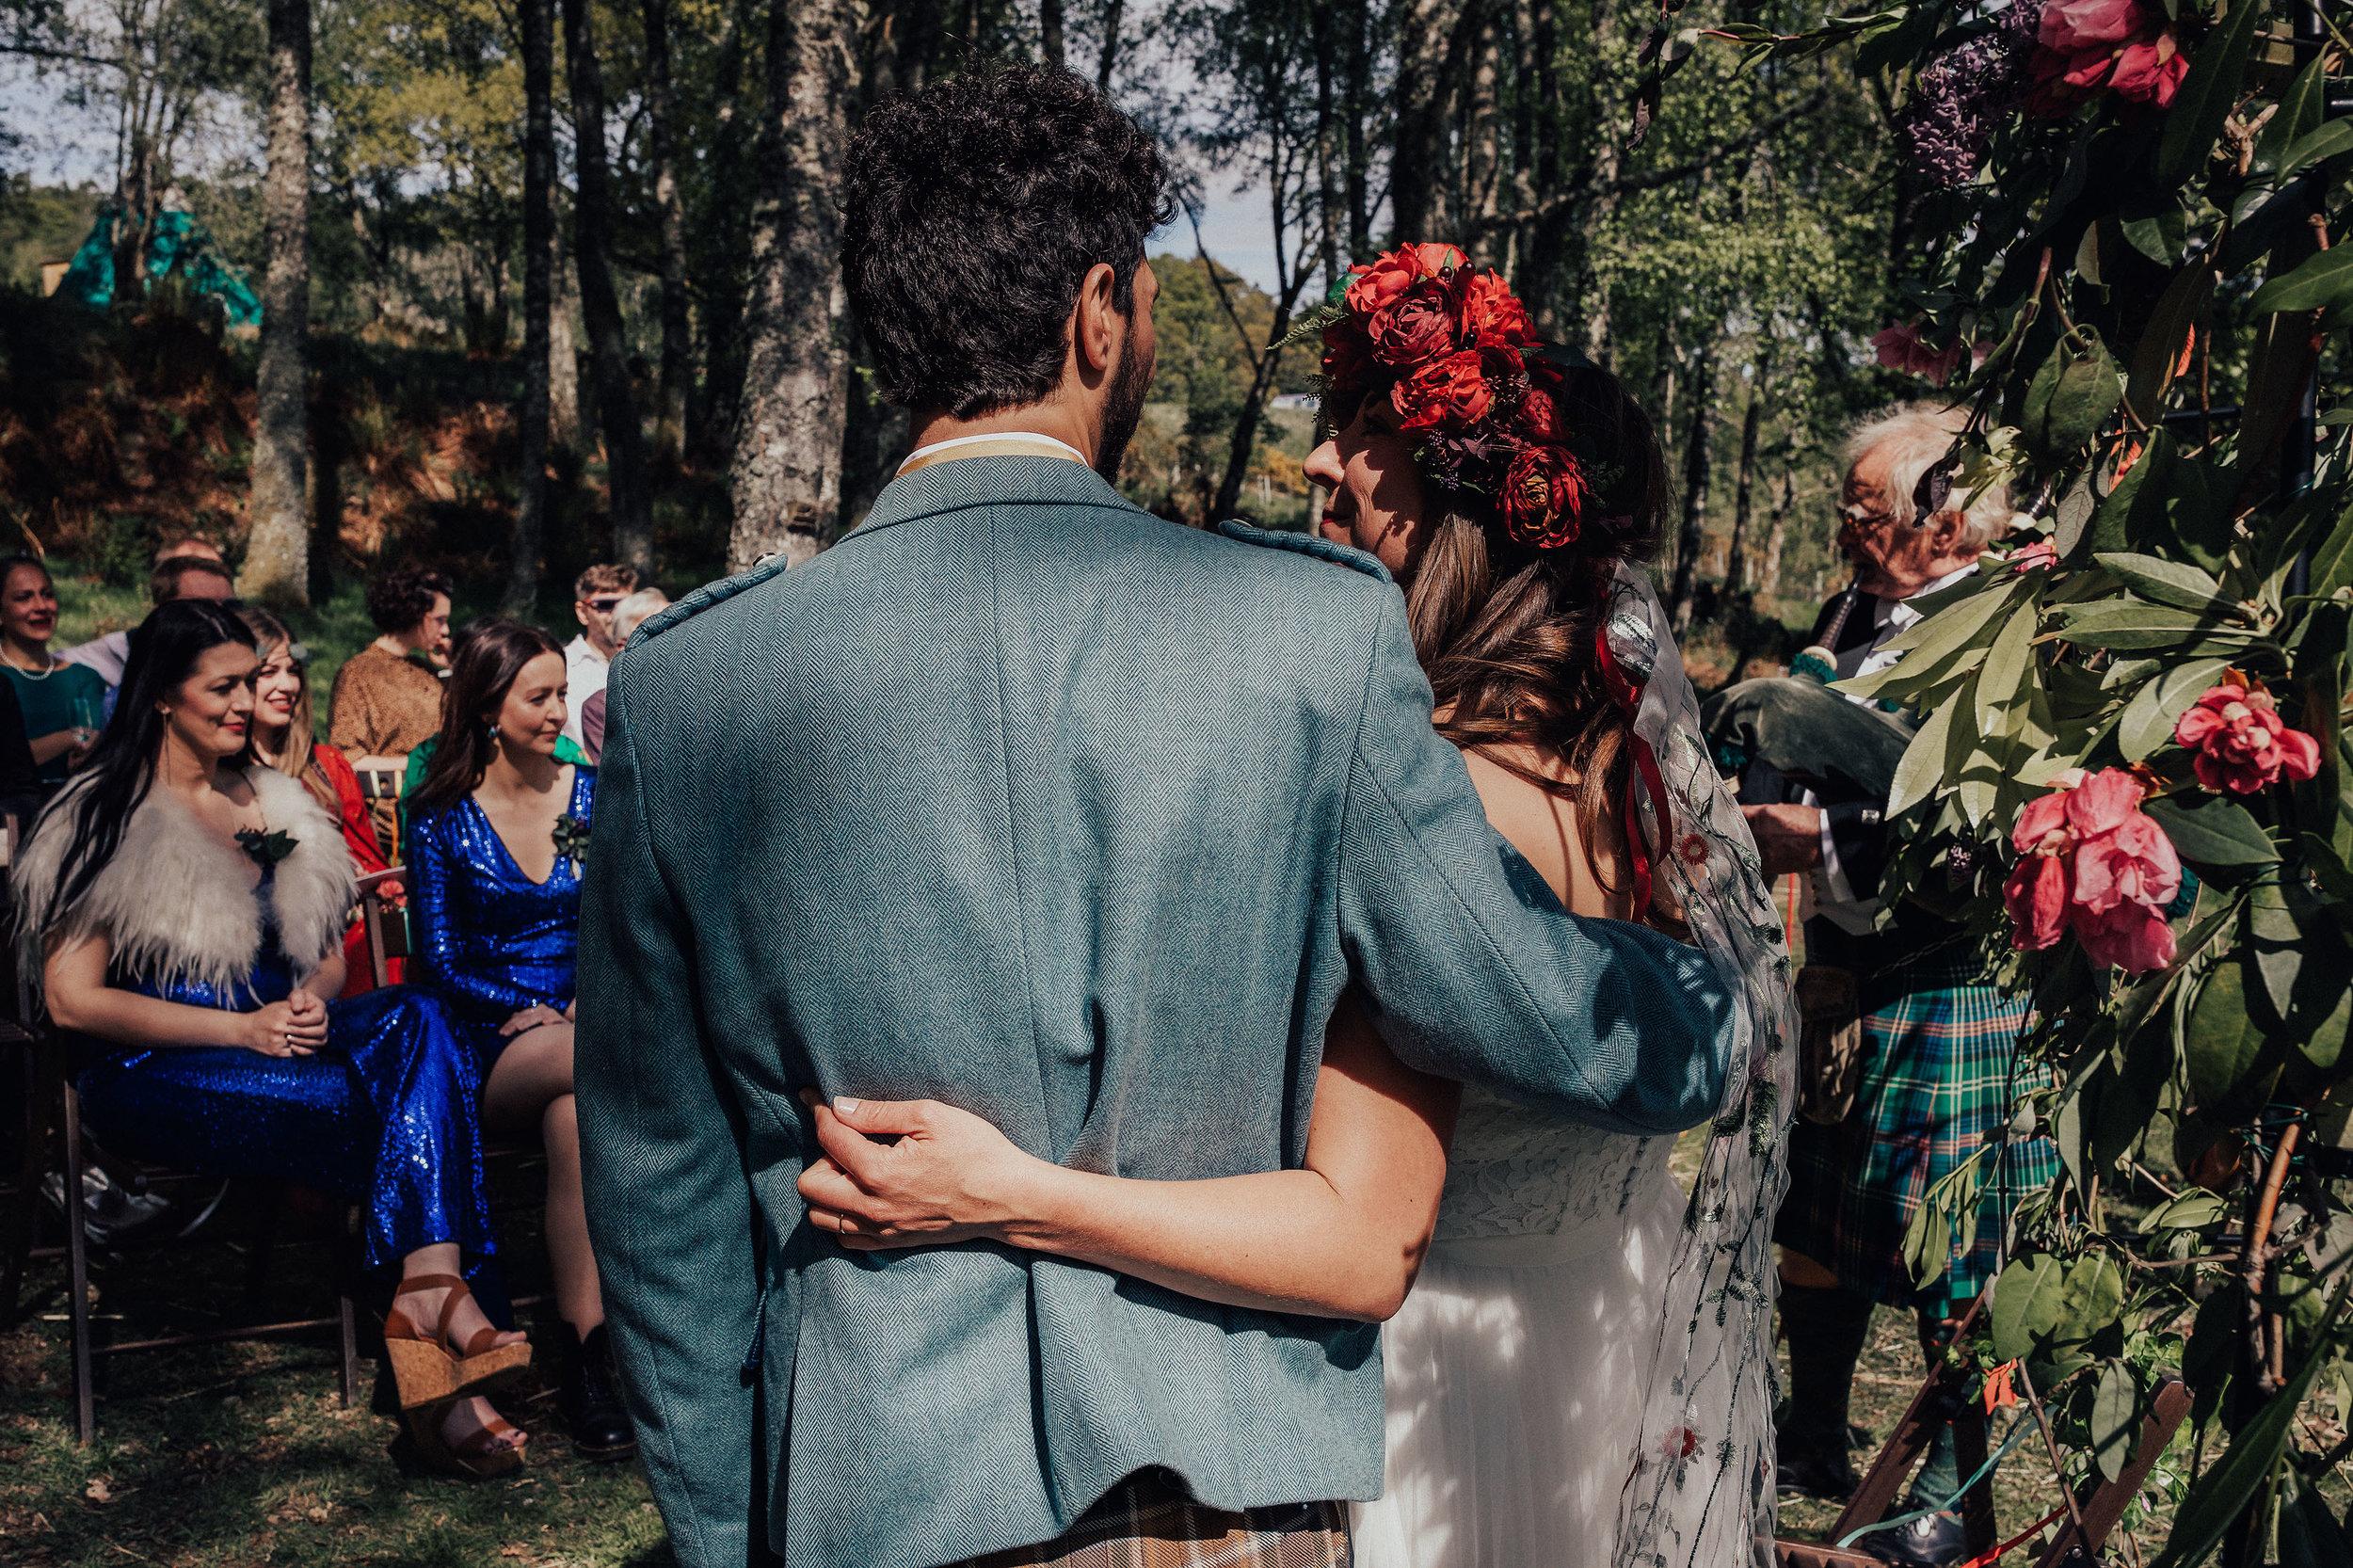 COMRIE_CROFT_WEDDINGS_PJ_PHILLIPS_PHOTOGRAPHY_85.jpg